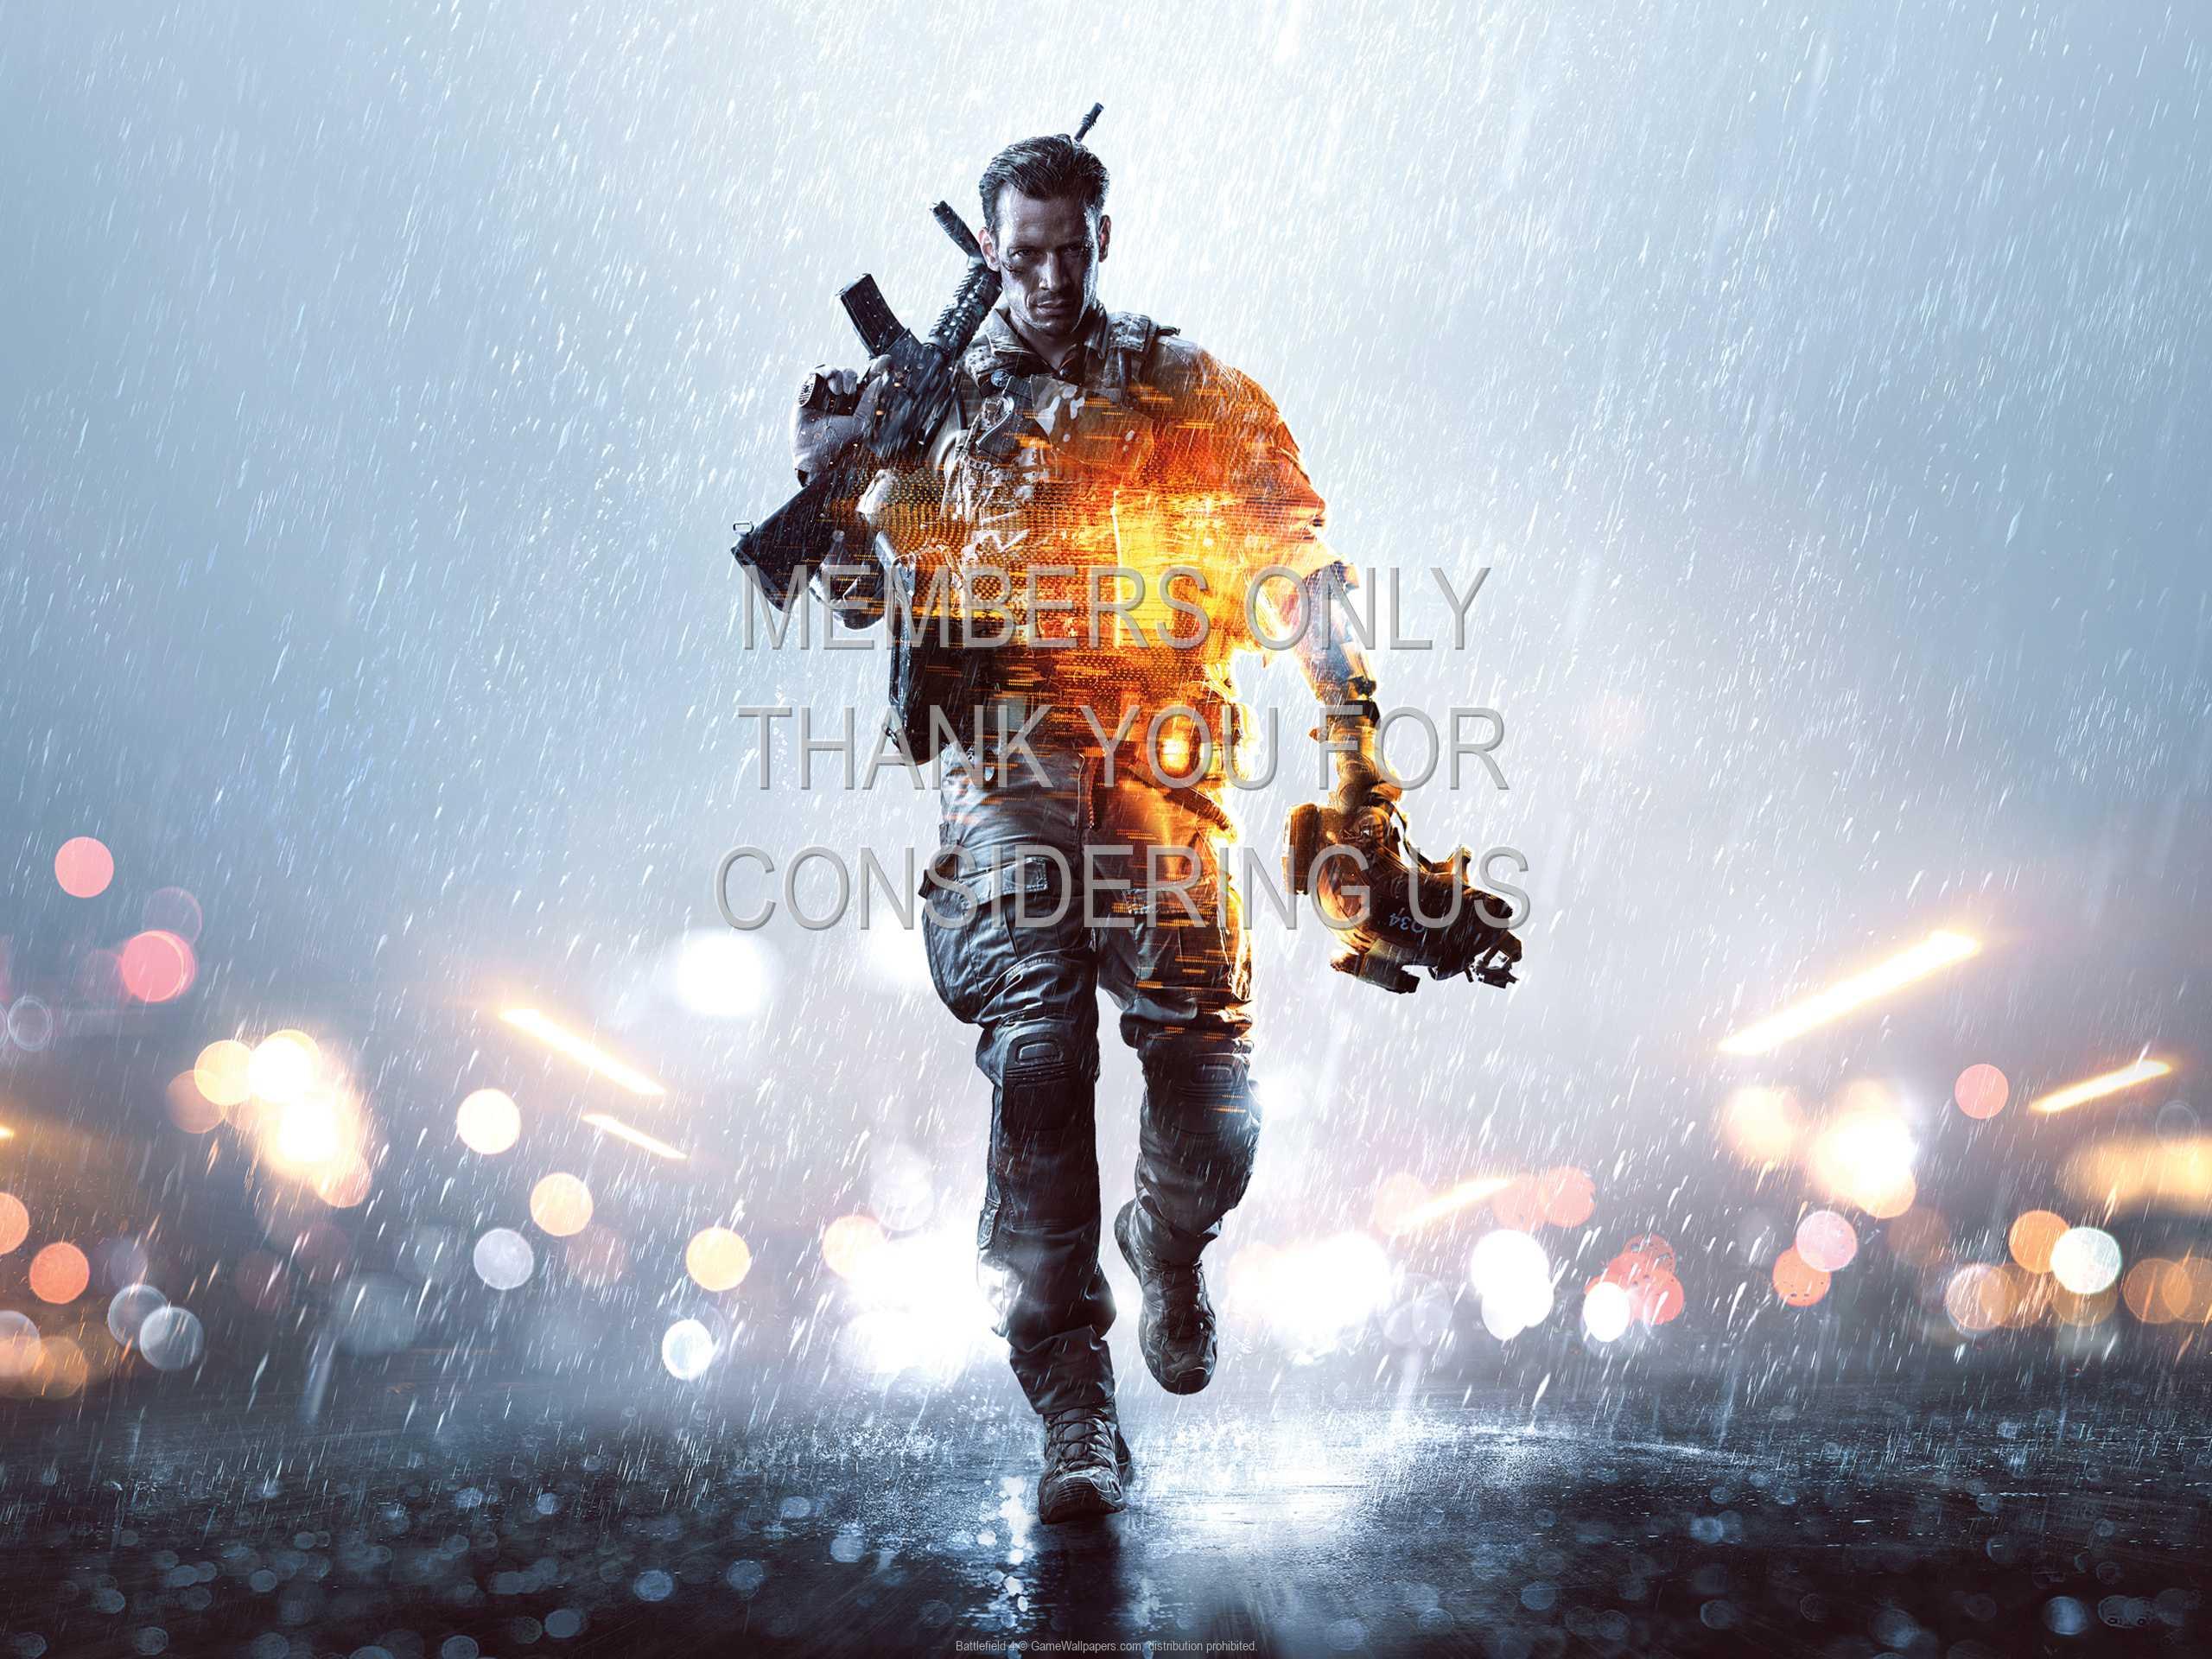 Battlefield 4 1080p Horizontal Mobile fond d'écran 02